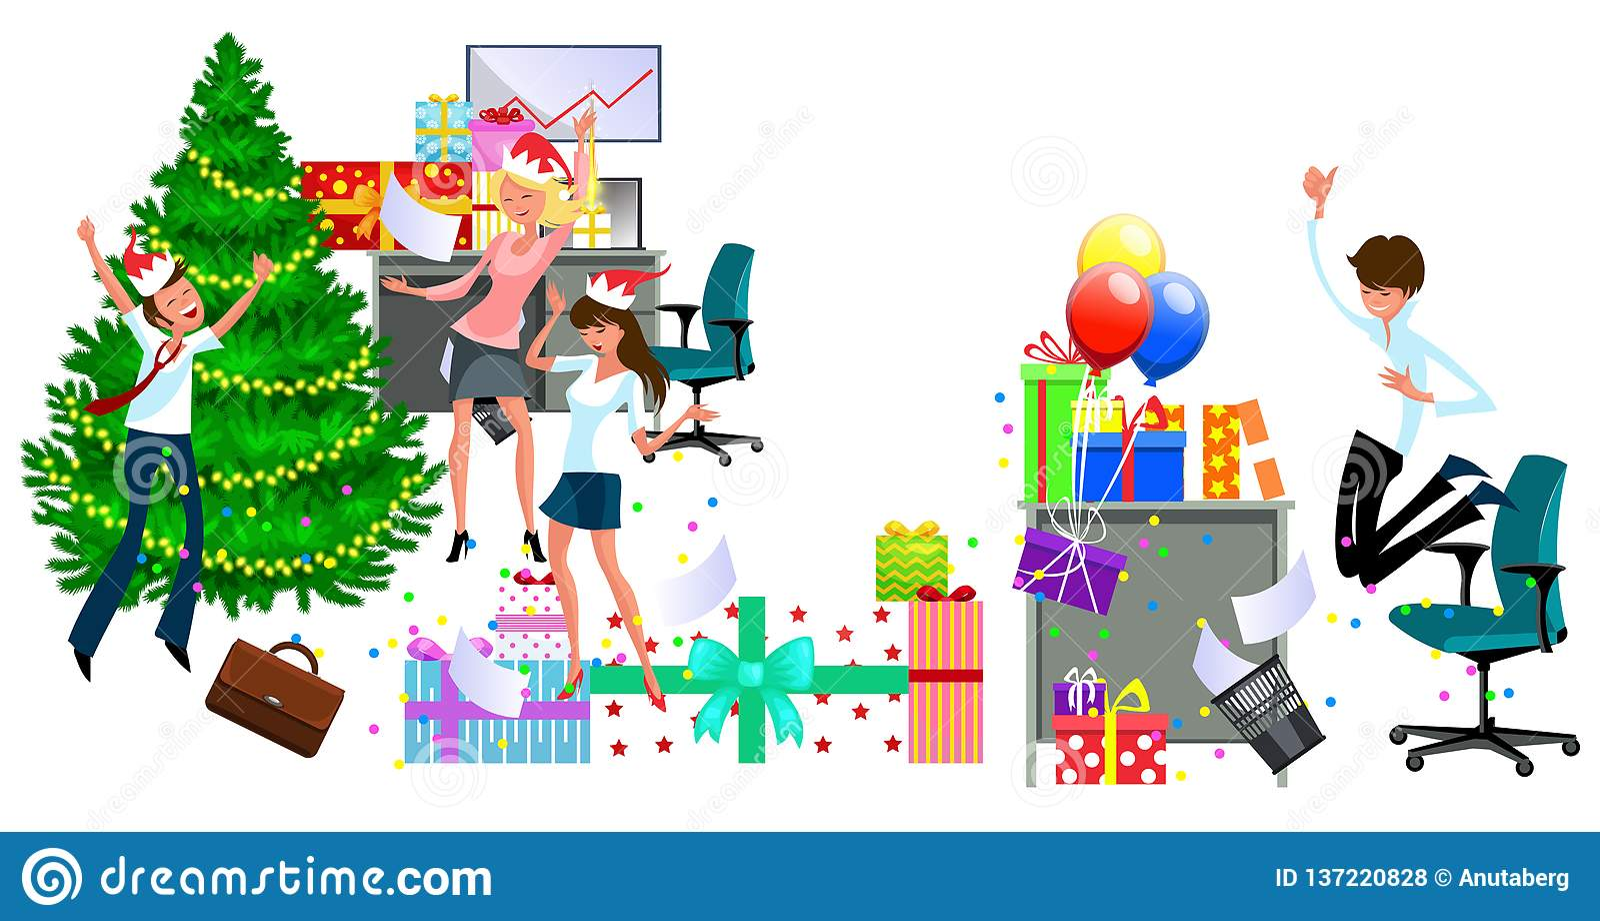 Cartoon Christmas Party At Work In Office Stock Vector Illustration Of Humor Joyful 137220828